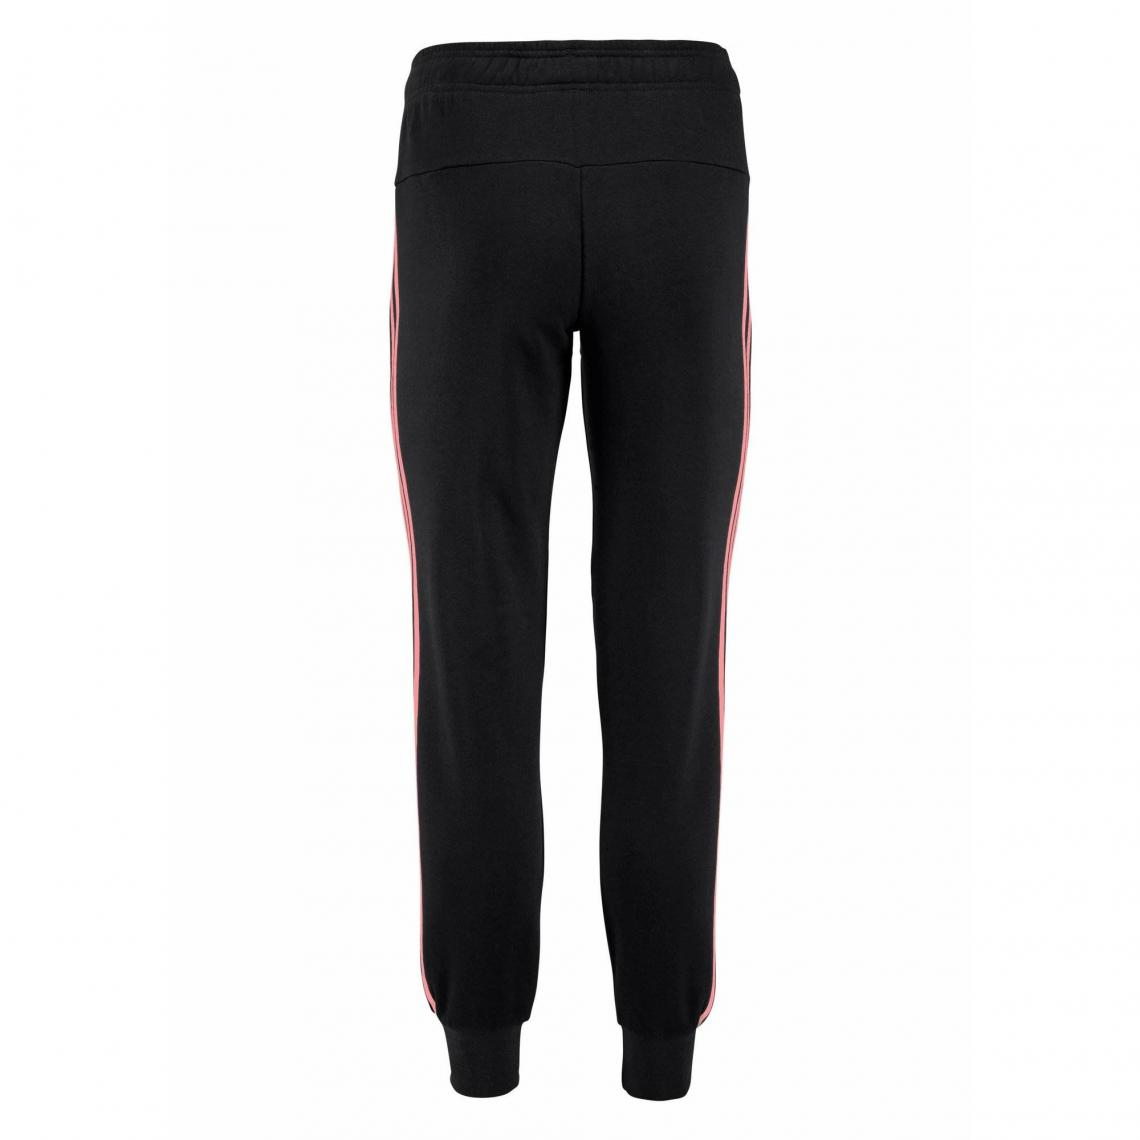 Jogging adidas Performance Essential 3S pant cuffed femme - Noir Adidas  Performance 8578ee7440a